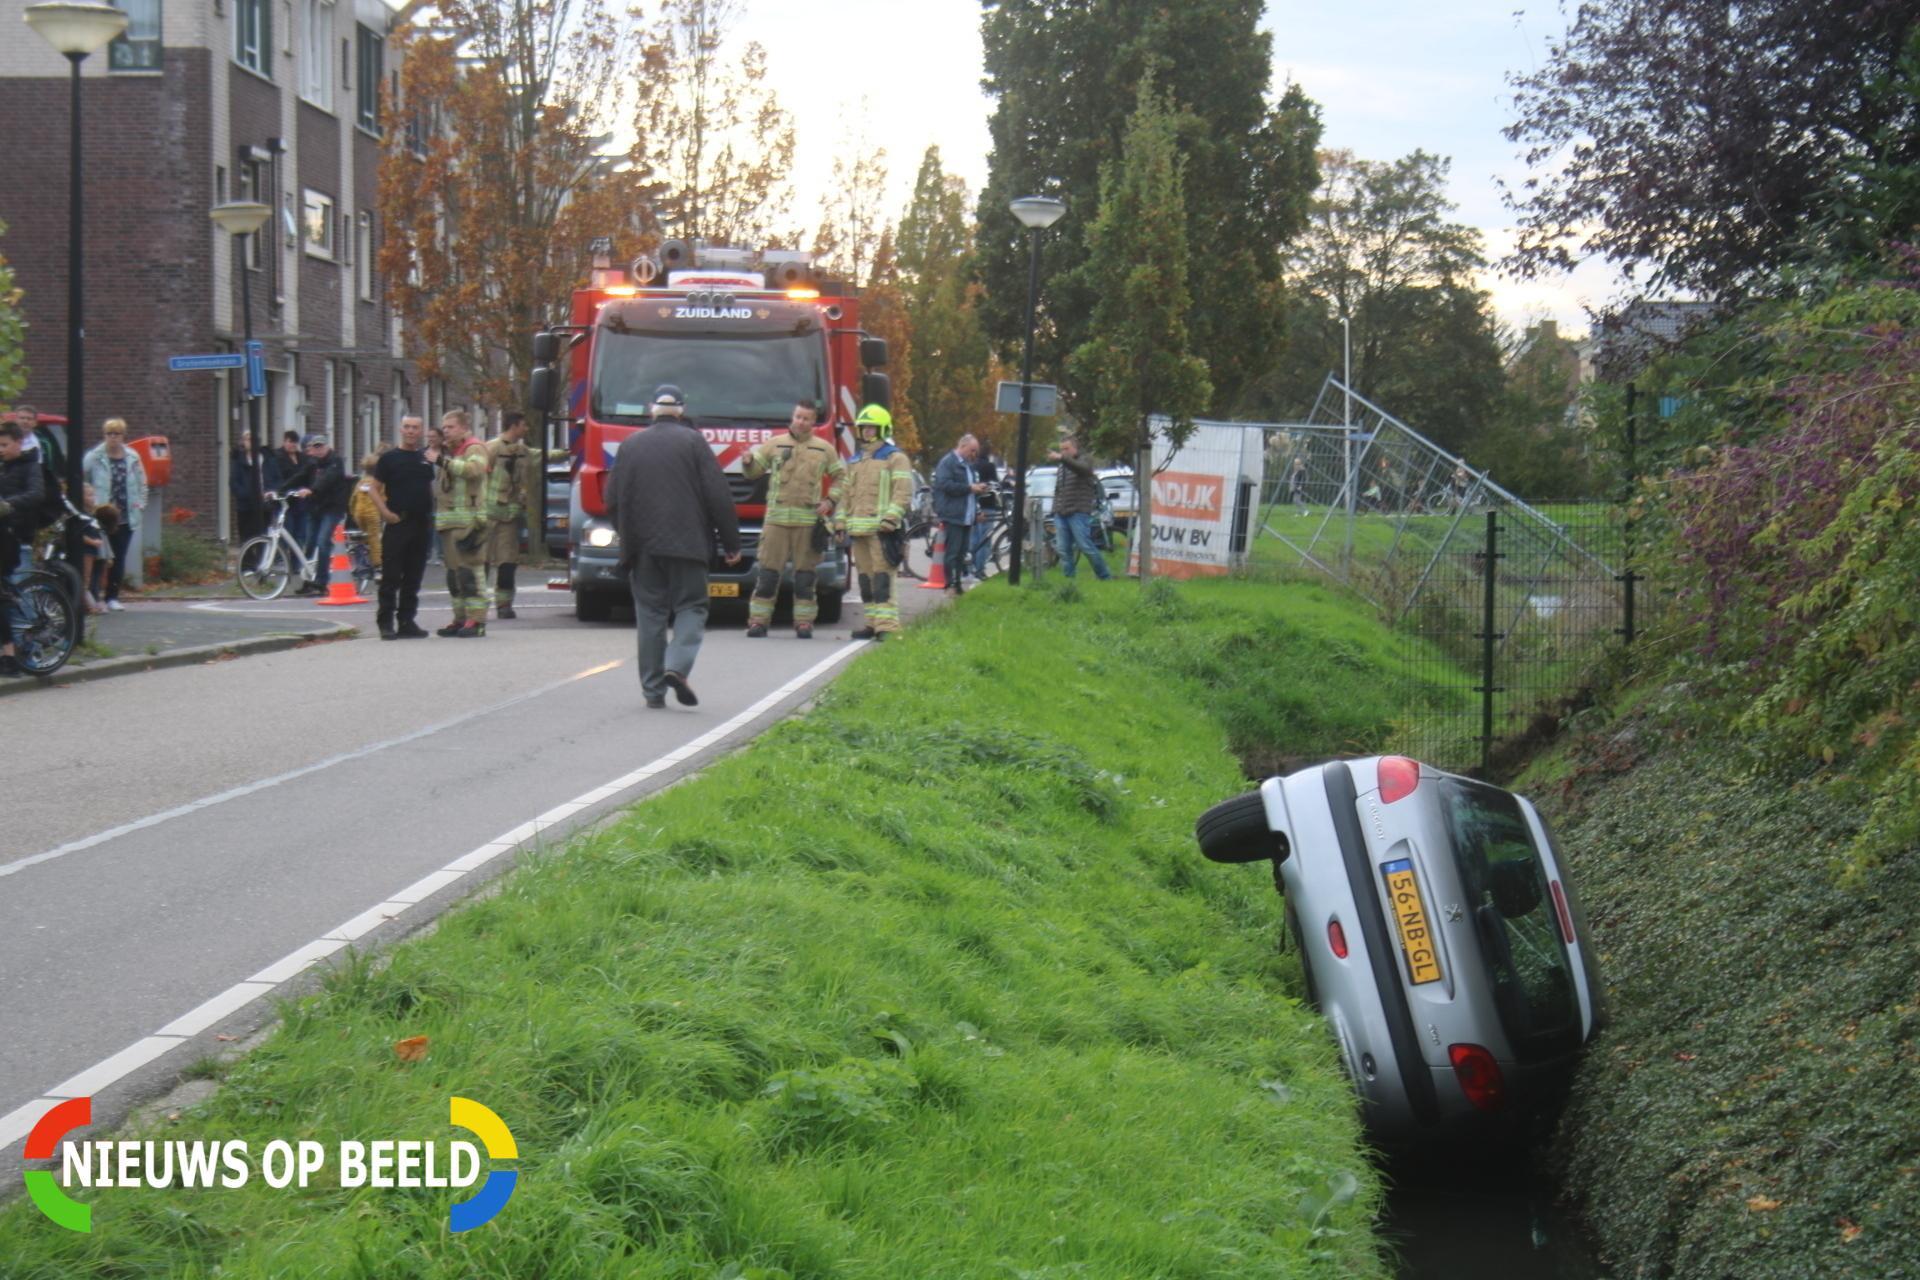 Auto in de sloot na onwelwording Beeldsweg Zuidland